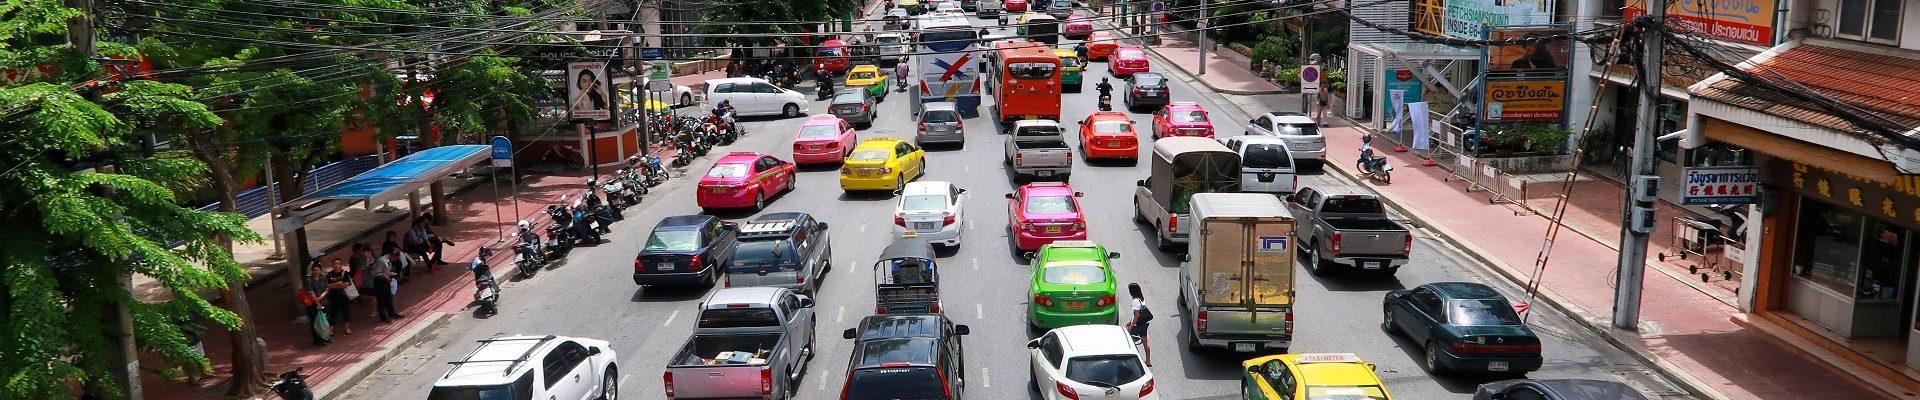 5 cosa da fare a Bangkok